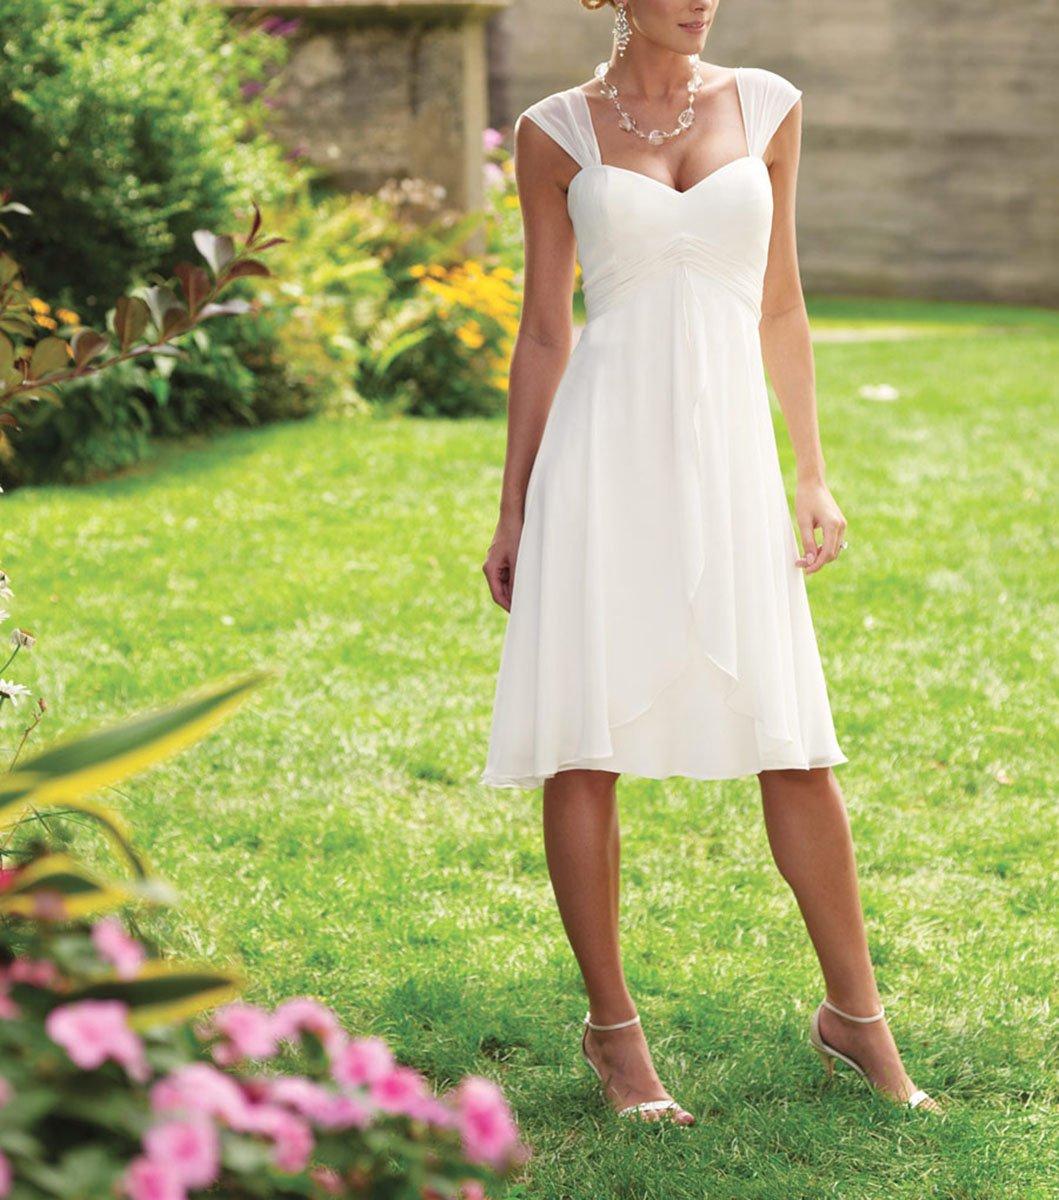 Udresses 2017 Knee Length Vestidos de Novia Simple Chiffon Wedding Dresses with Cap Sleeves Z5 at Amazon Womens Clothing store: